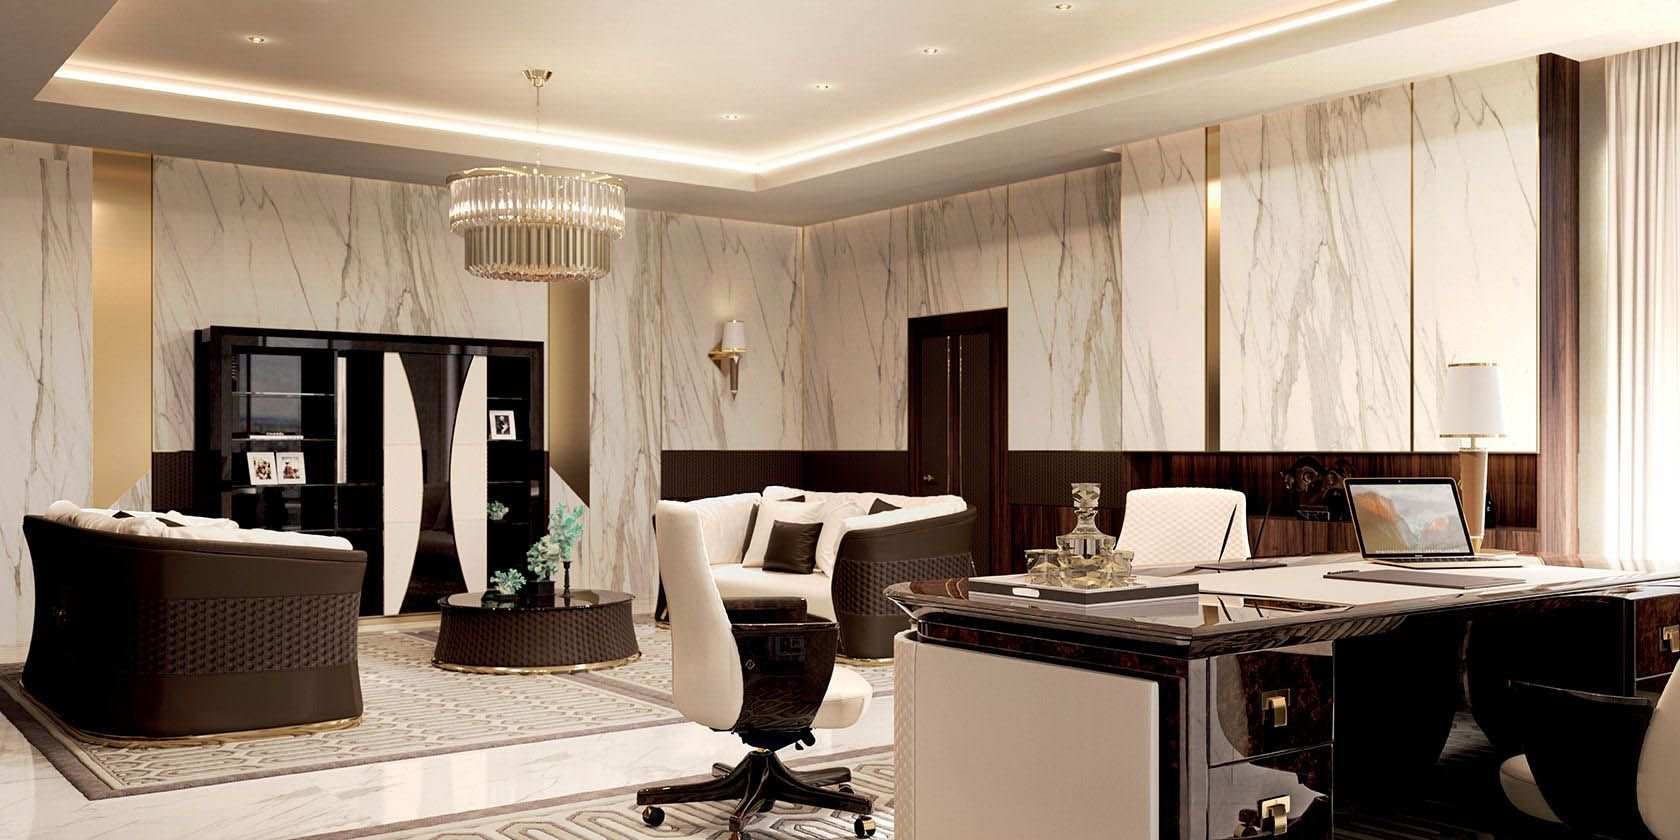 Fantastic Selaras Home Office Furniture Kota Jakarta Barat Daerah Khusus Ibukota Jakarta Only Office Furniture Modern Office Interior Design Office Interiors